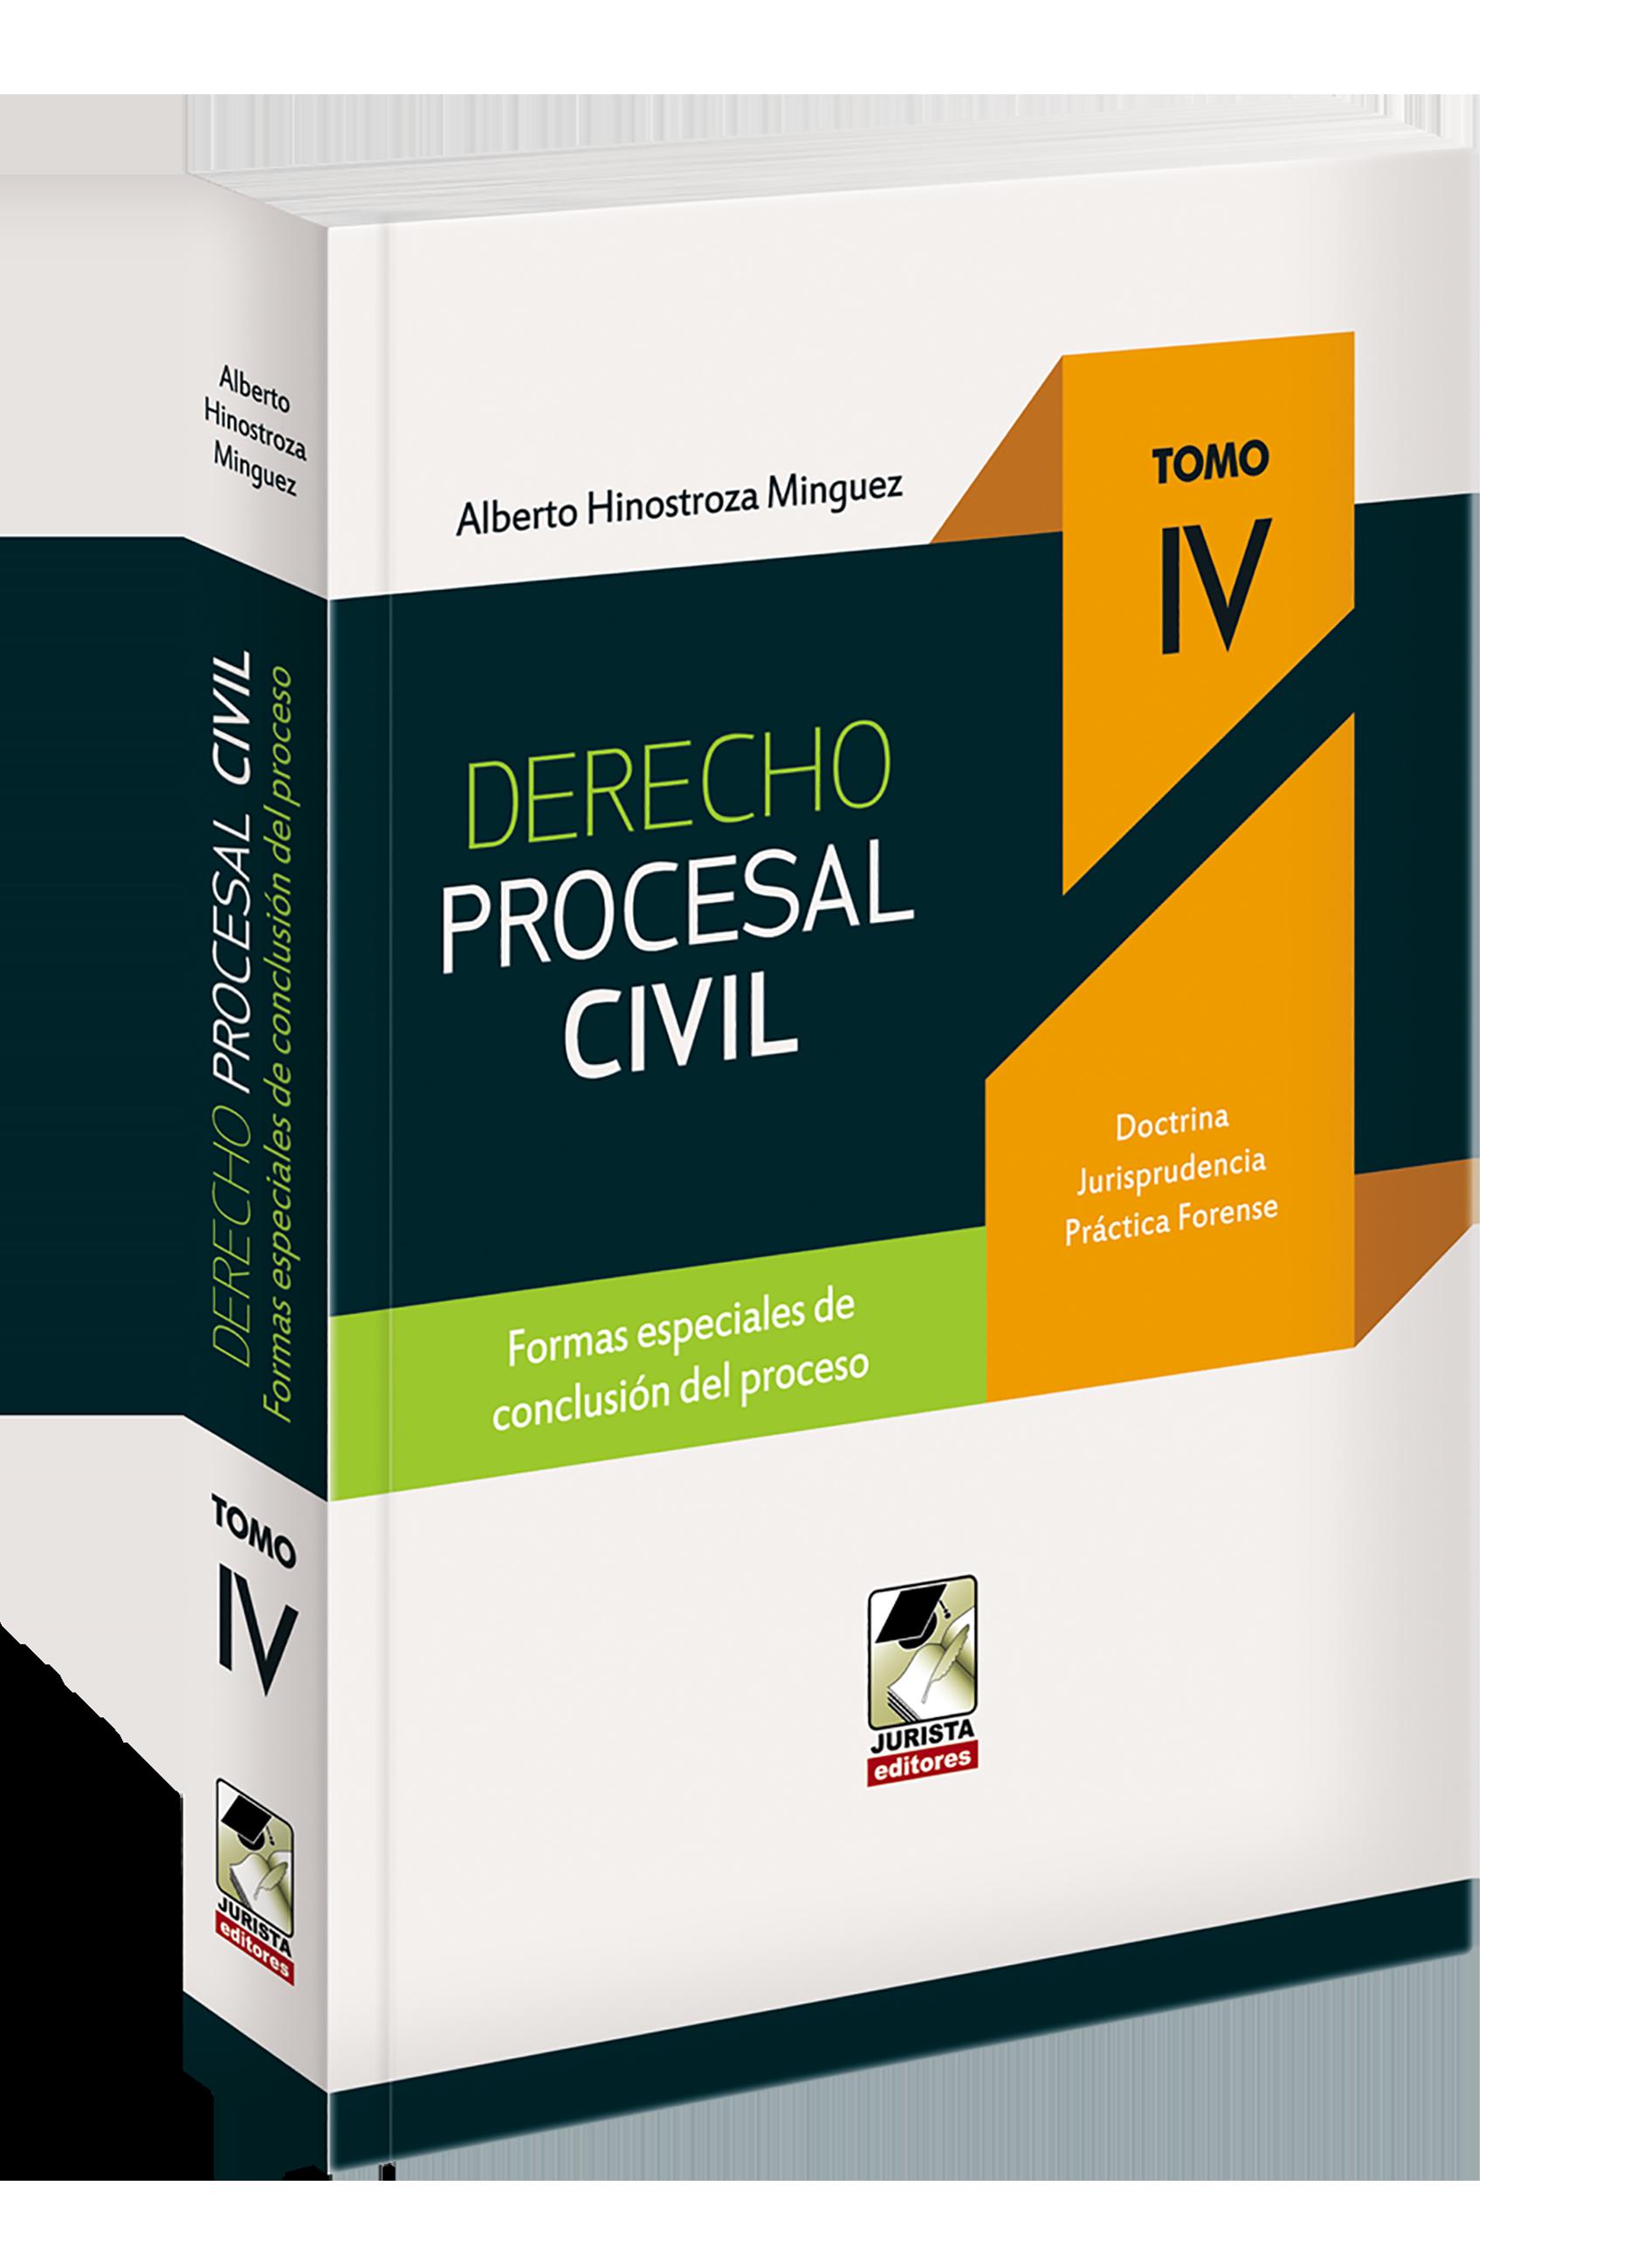 Derecho procesal civil - Tomo IV